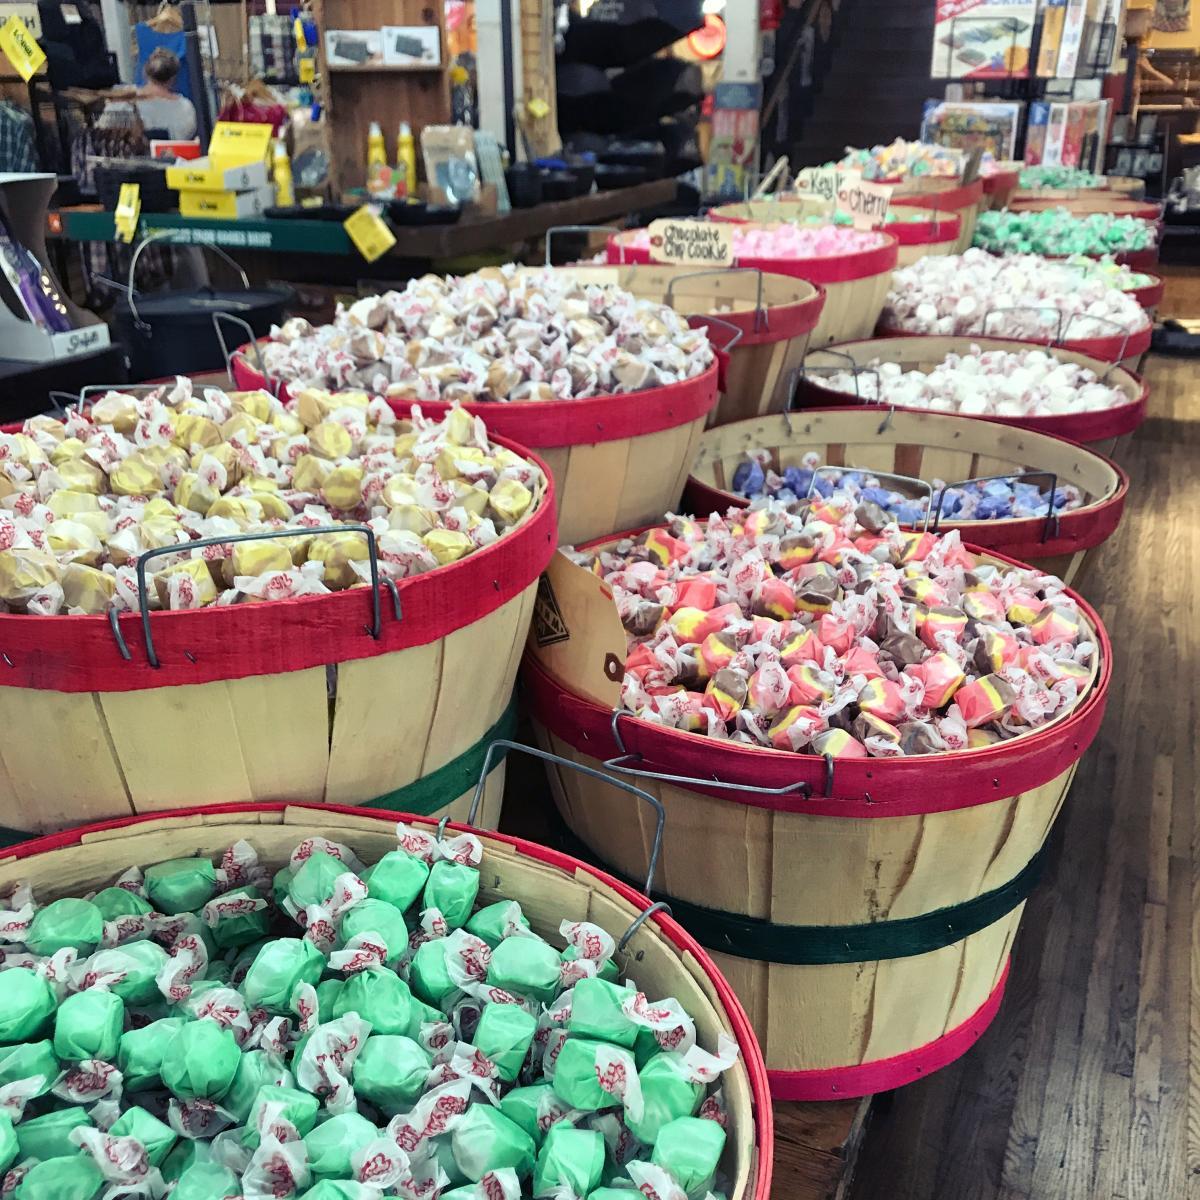 u.g. white mercantile candy